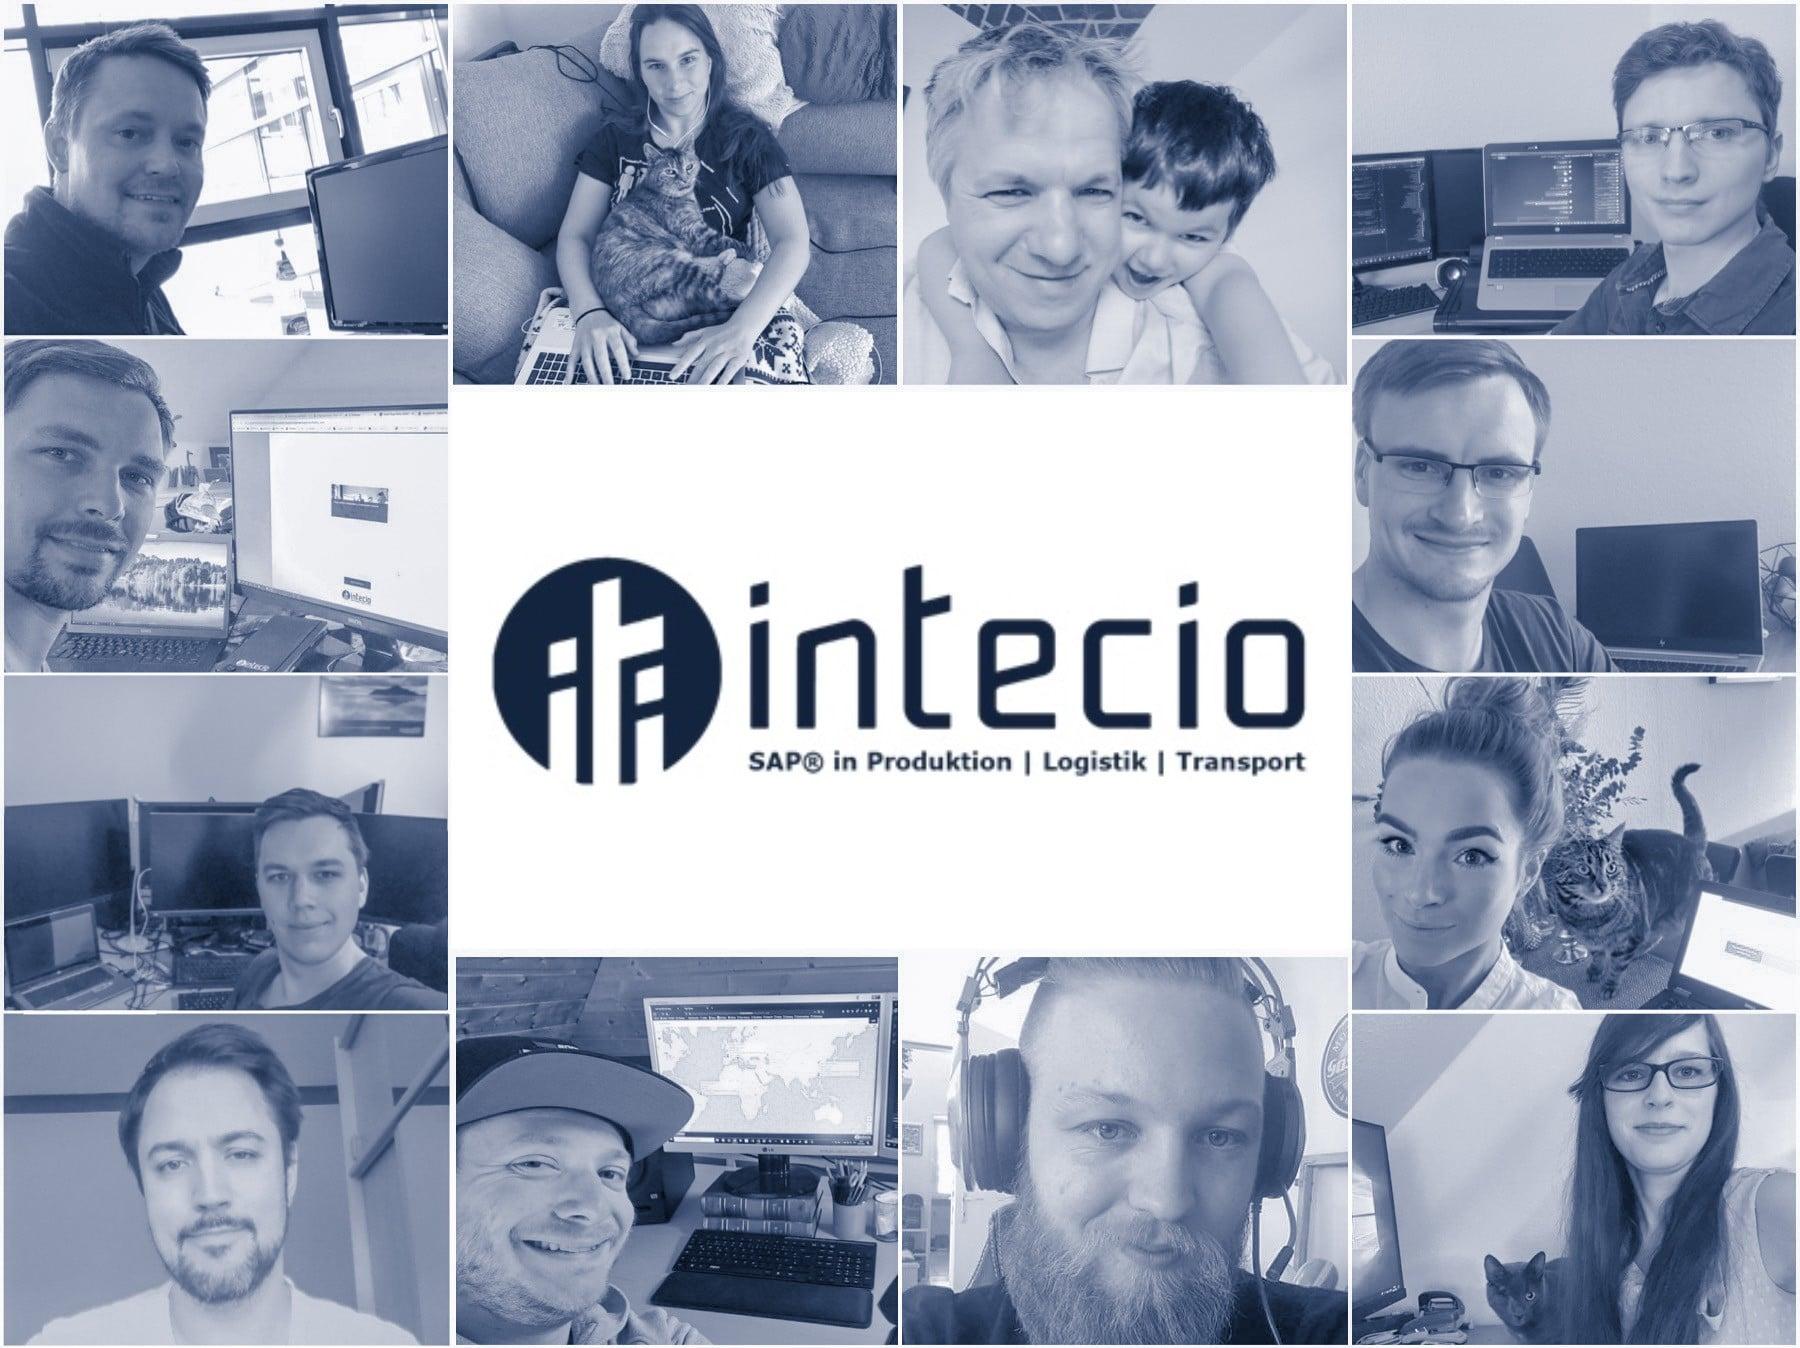 INTECIO Team